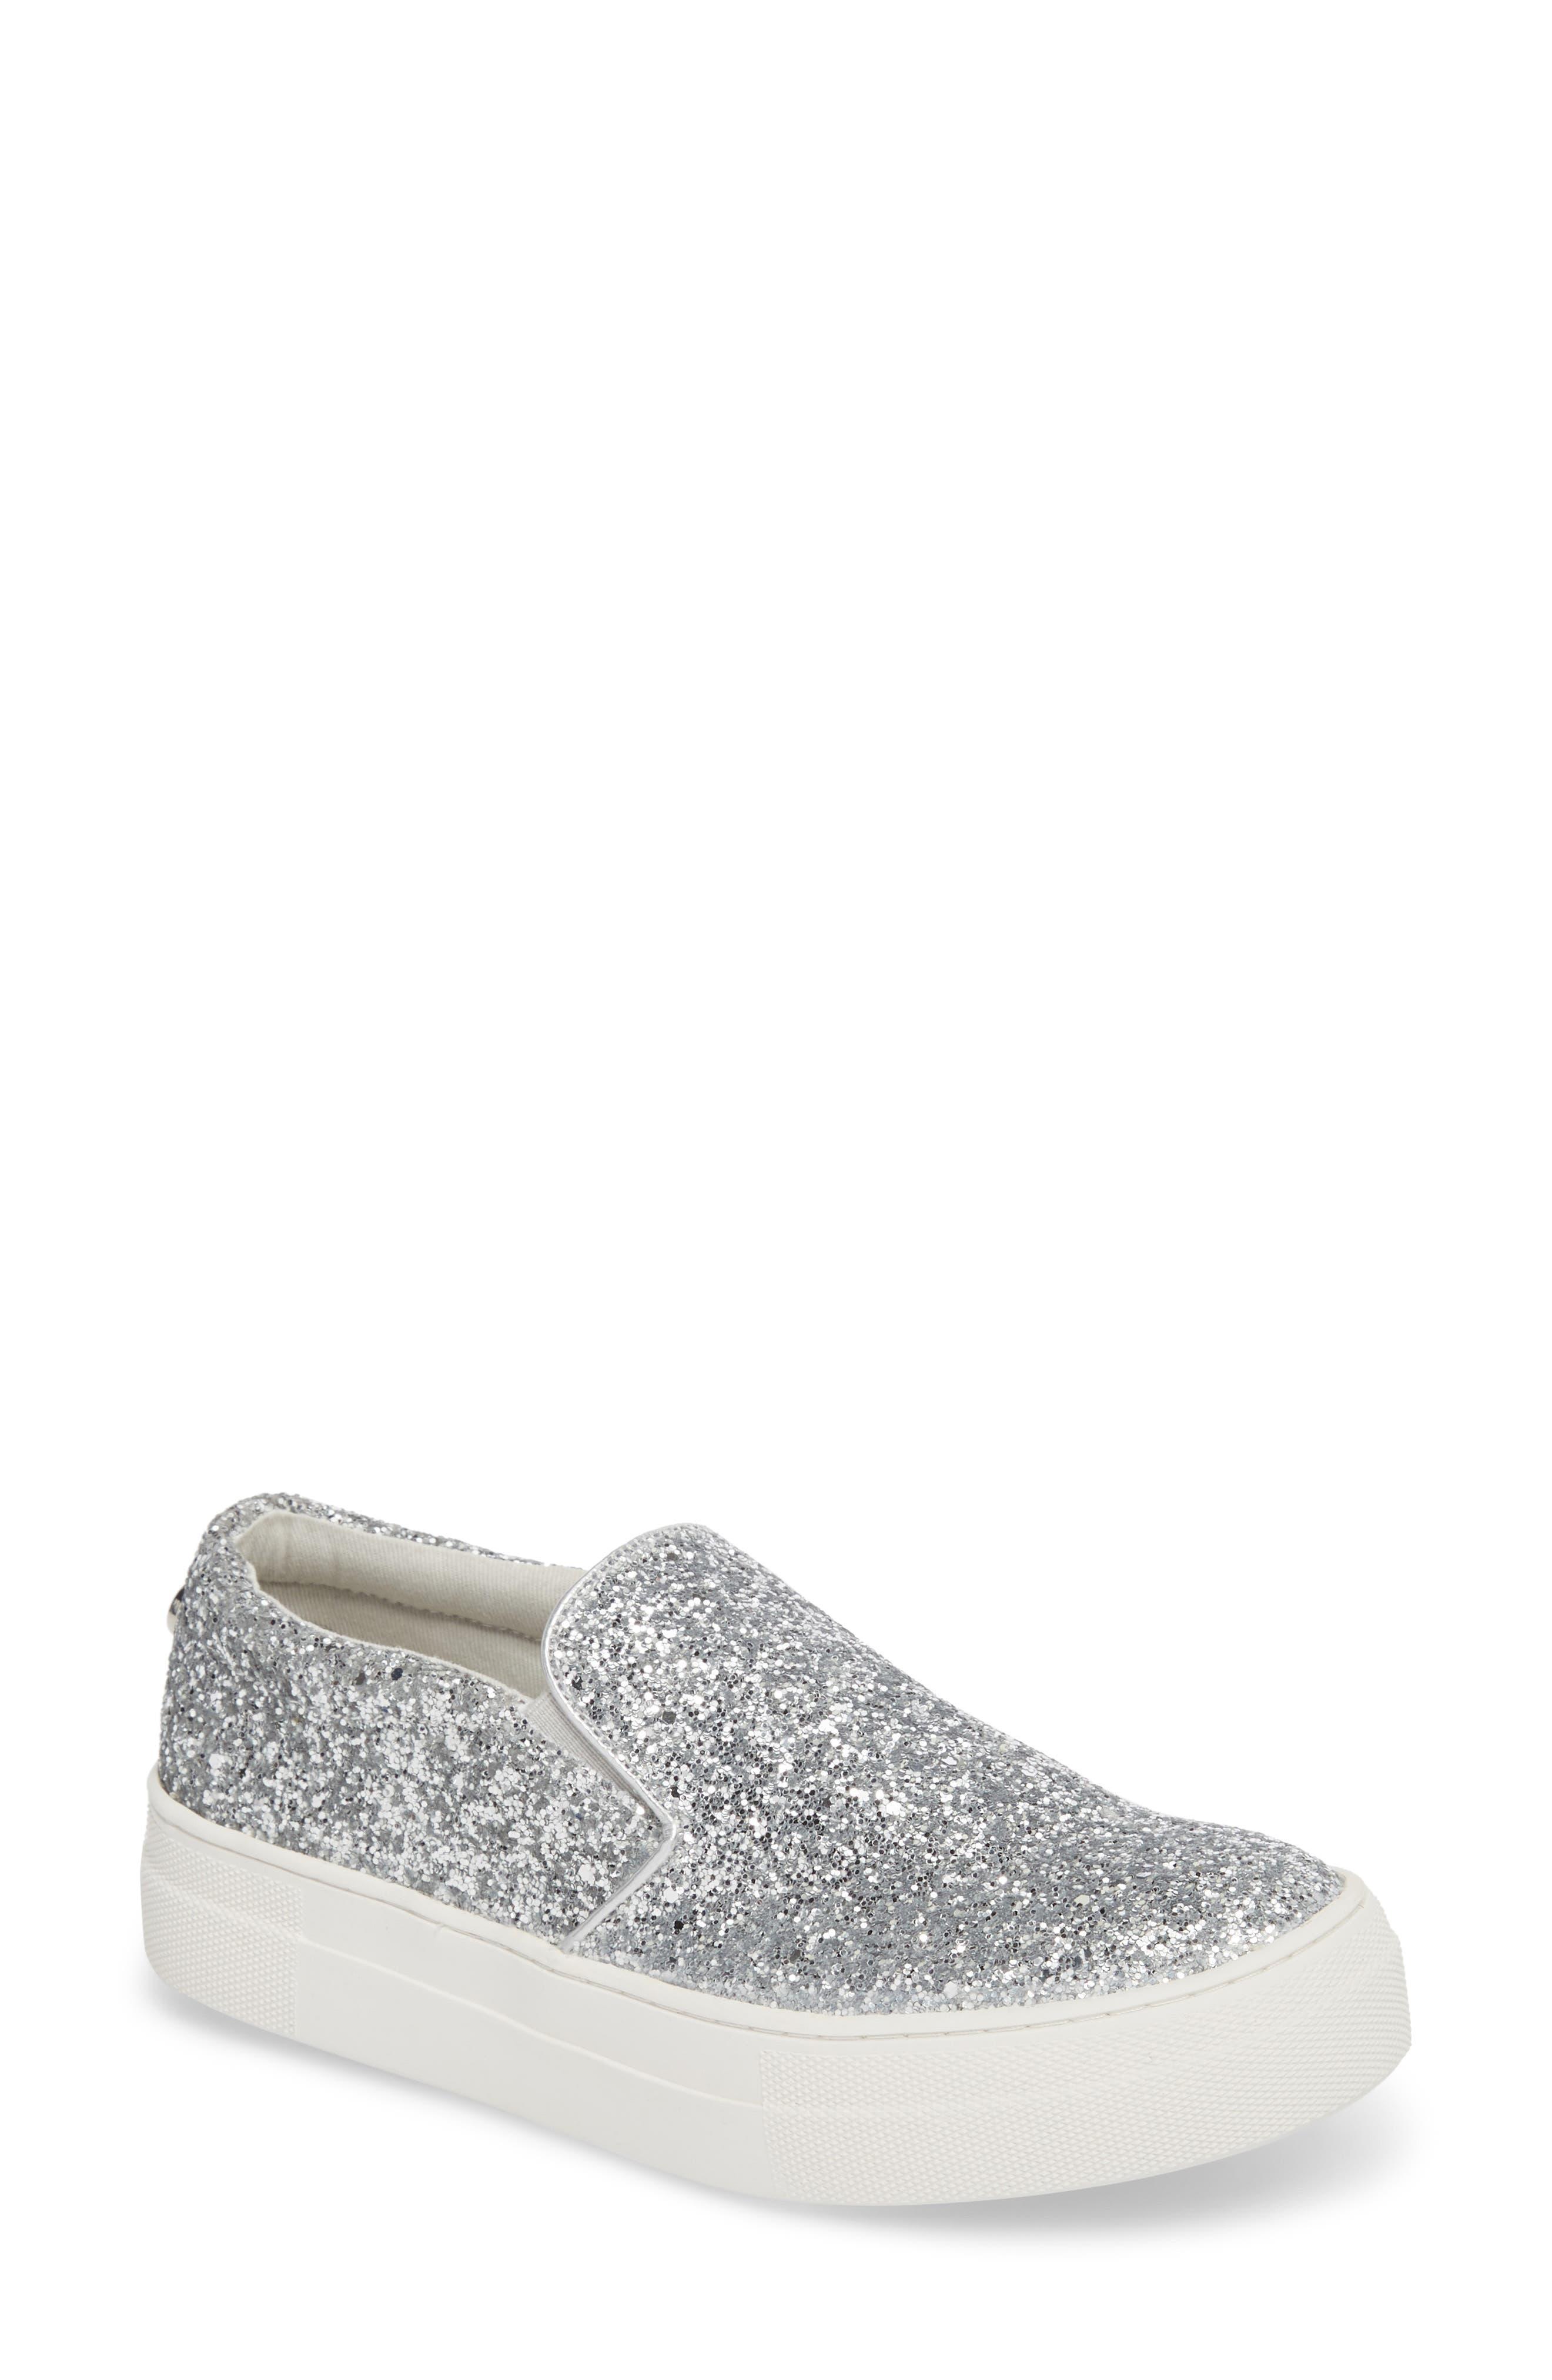 Gills Platform Slip-On Sneaker,                         Main,                         color, Silver Glitter